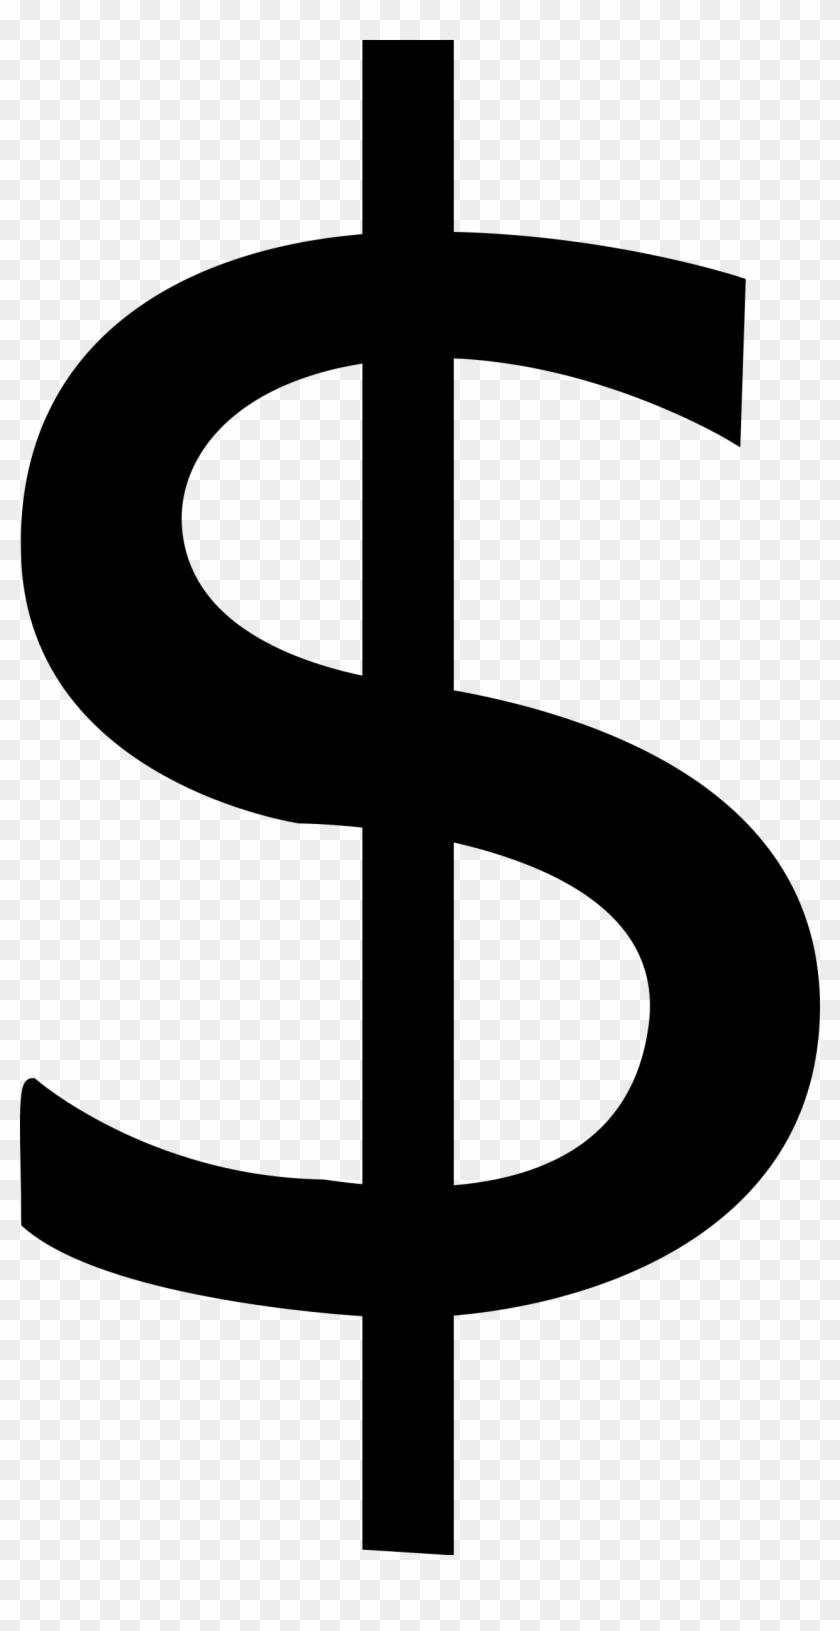 Dollar Sign Png.